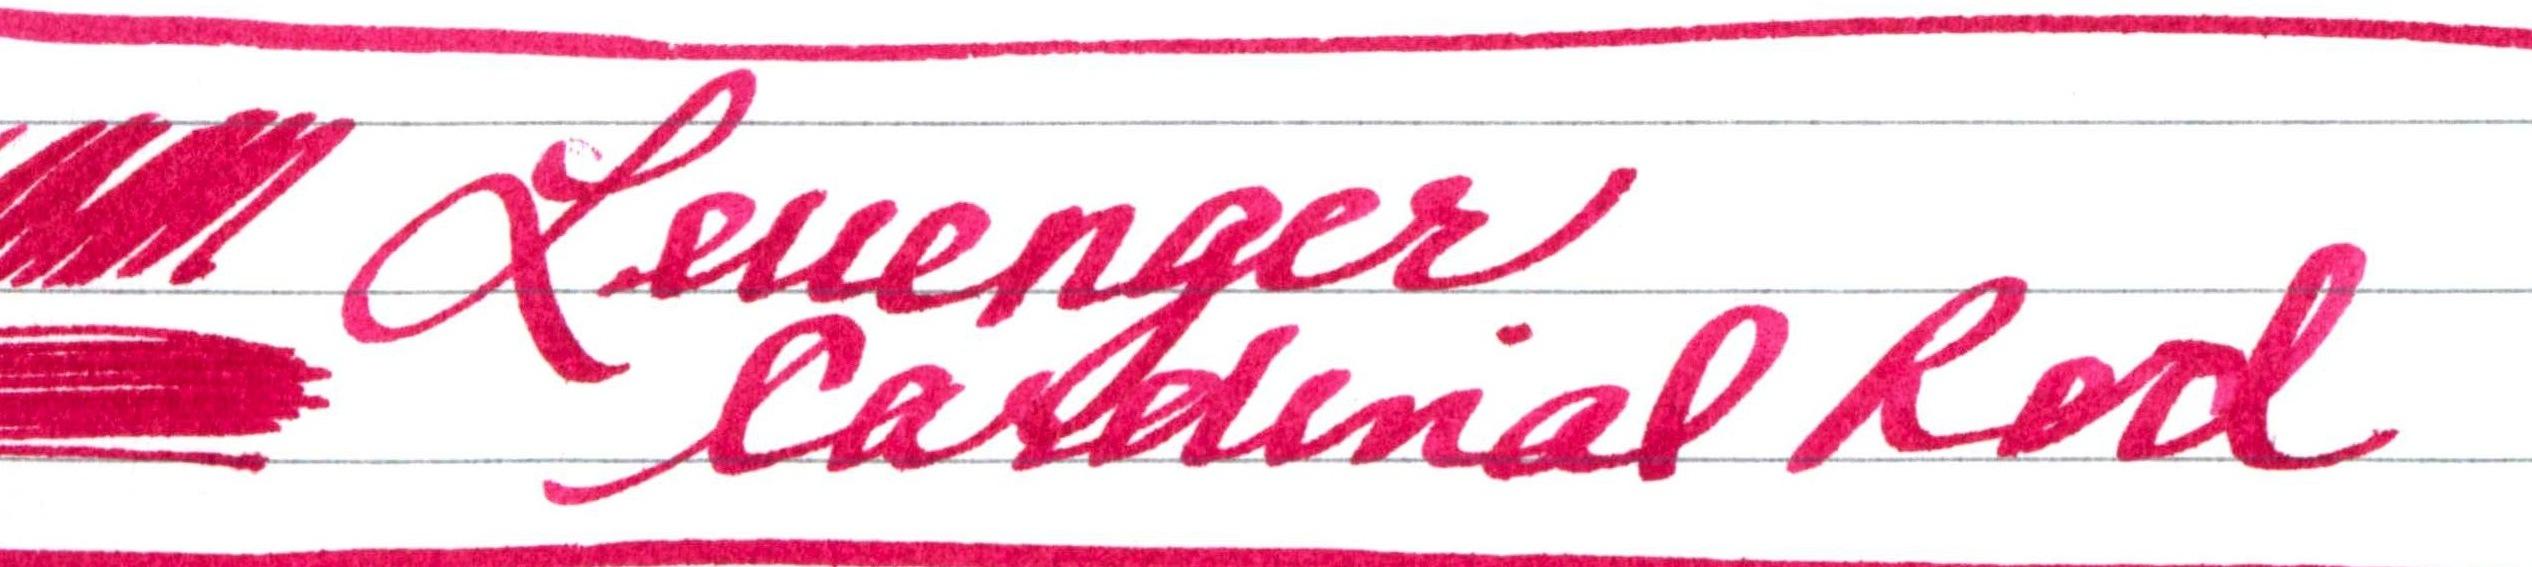 Levenger-Cardinal-Red.jpg